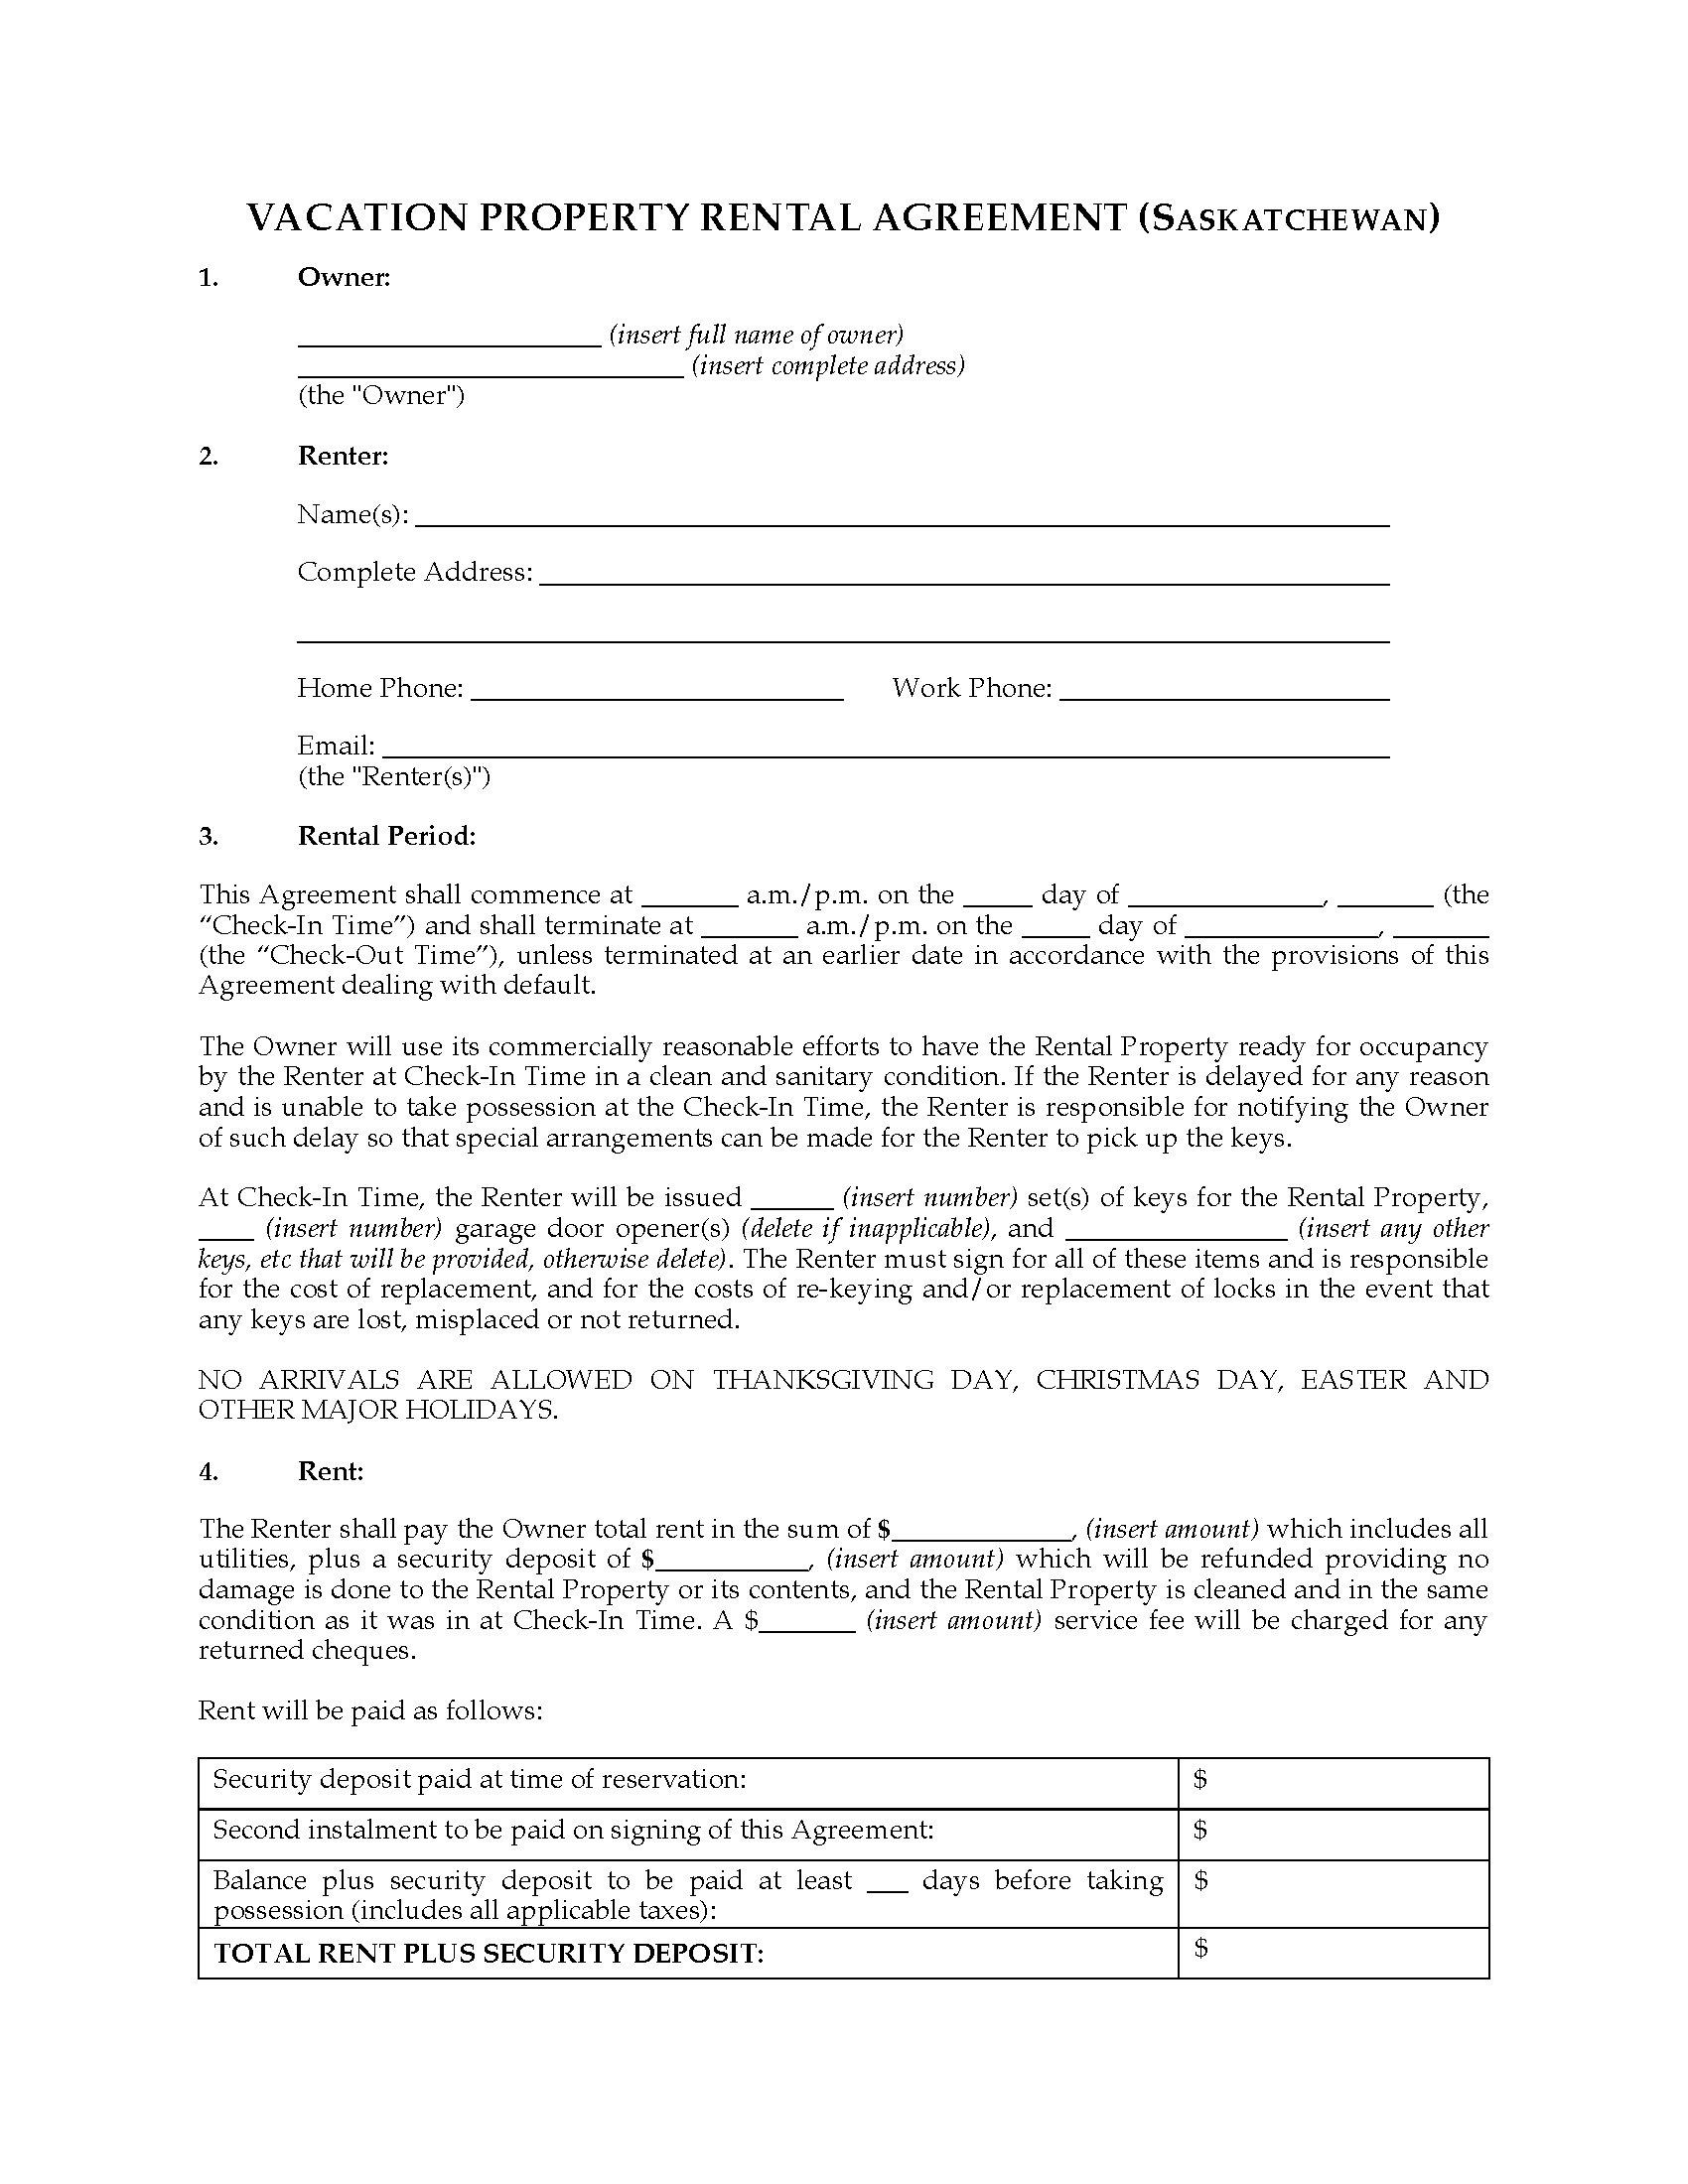 Saskatchewan Vacation Property Rental Agreement – Home Rental Agreement